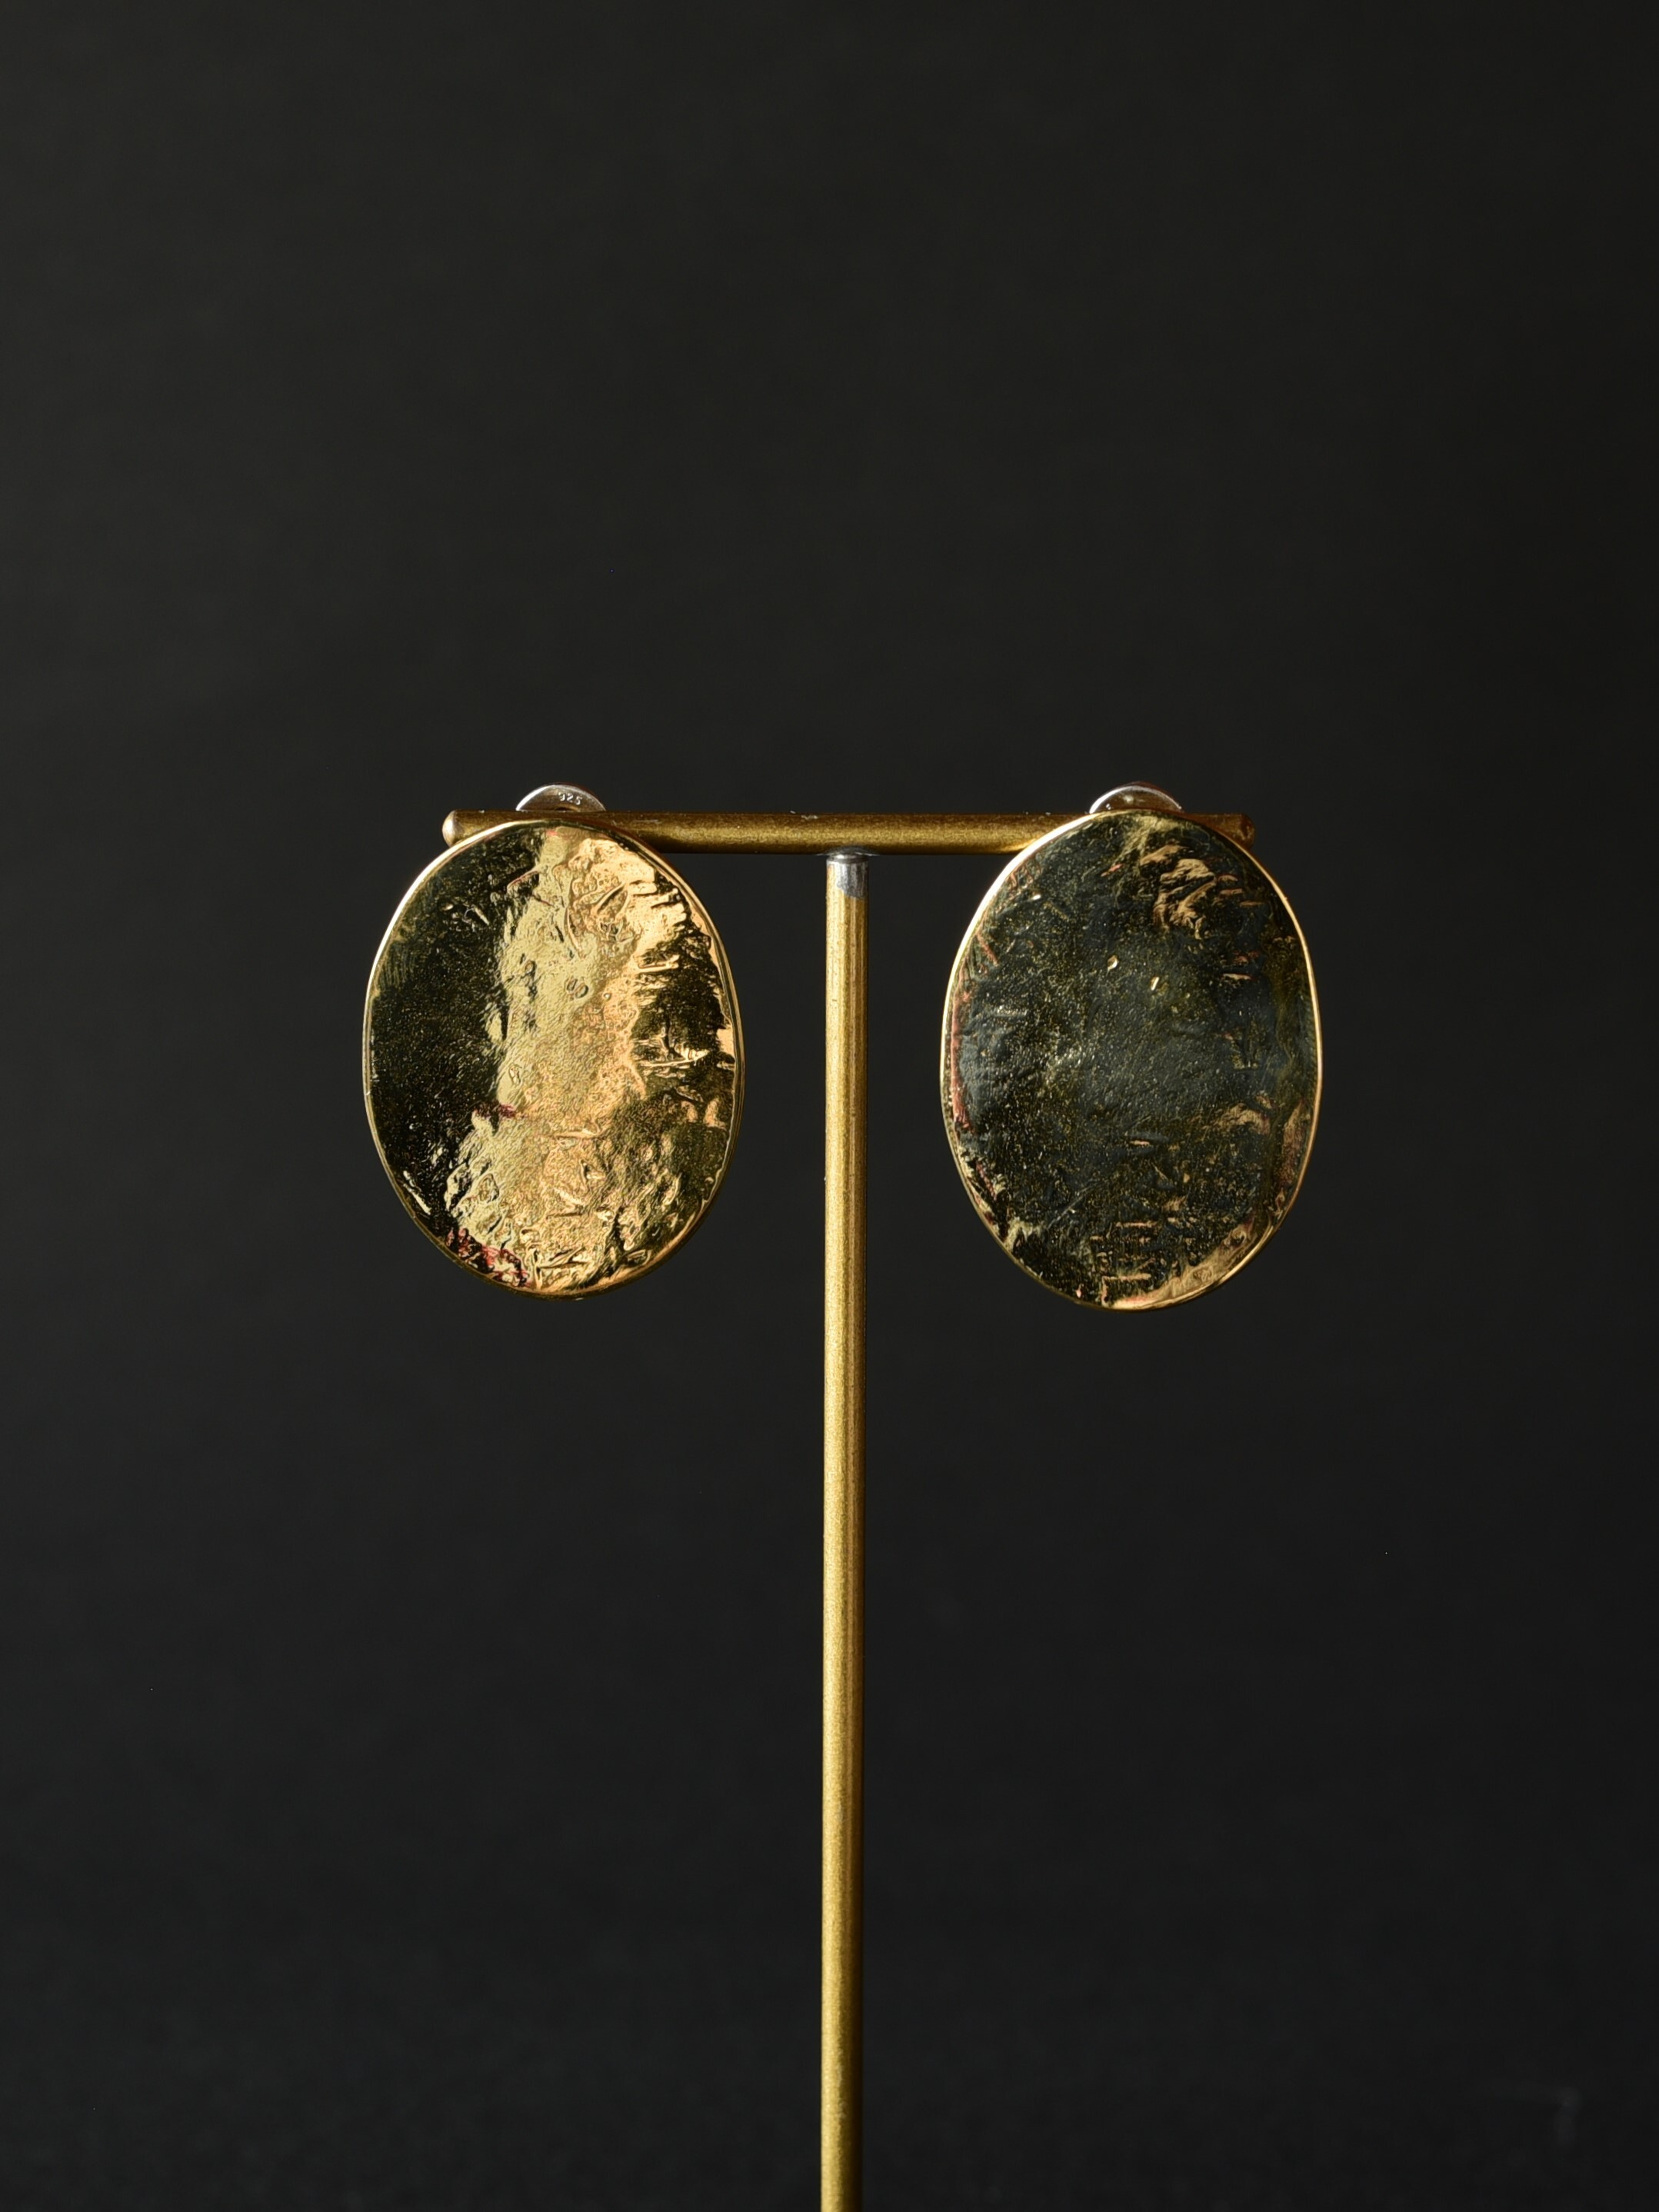 accessories mau|p116 平打ちオーバル ピアス brass